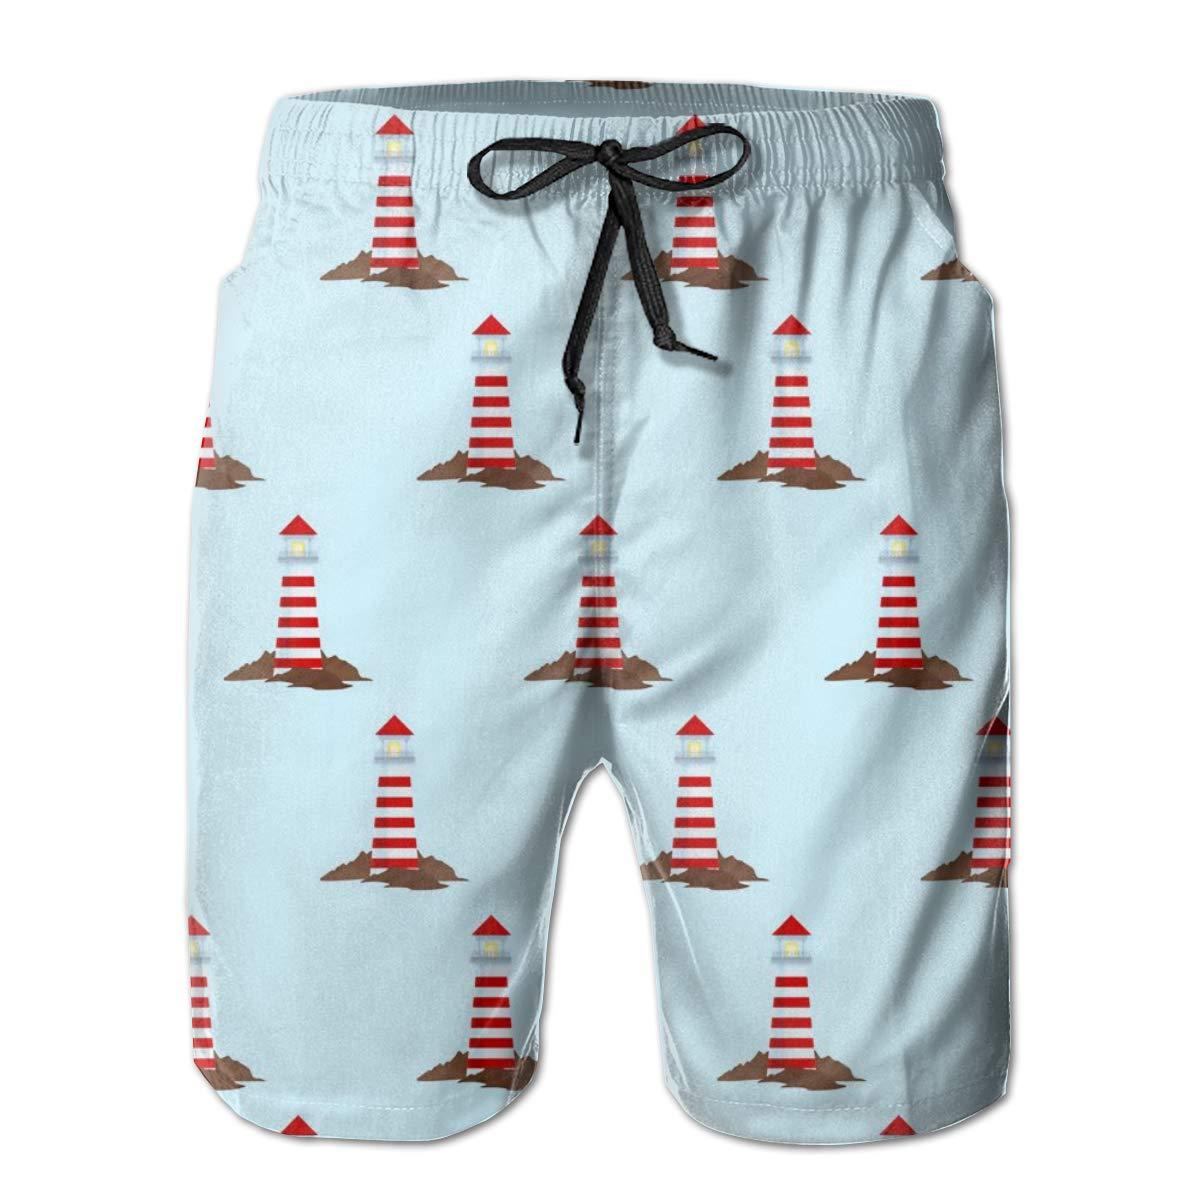 SARA NELL Mens Swim Trunks Ocean Nautical Lighthouse Surfing Beach Board Shorts Swimwear